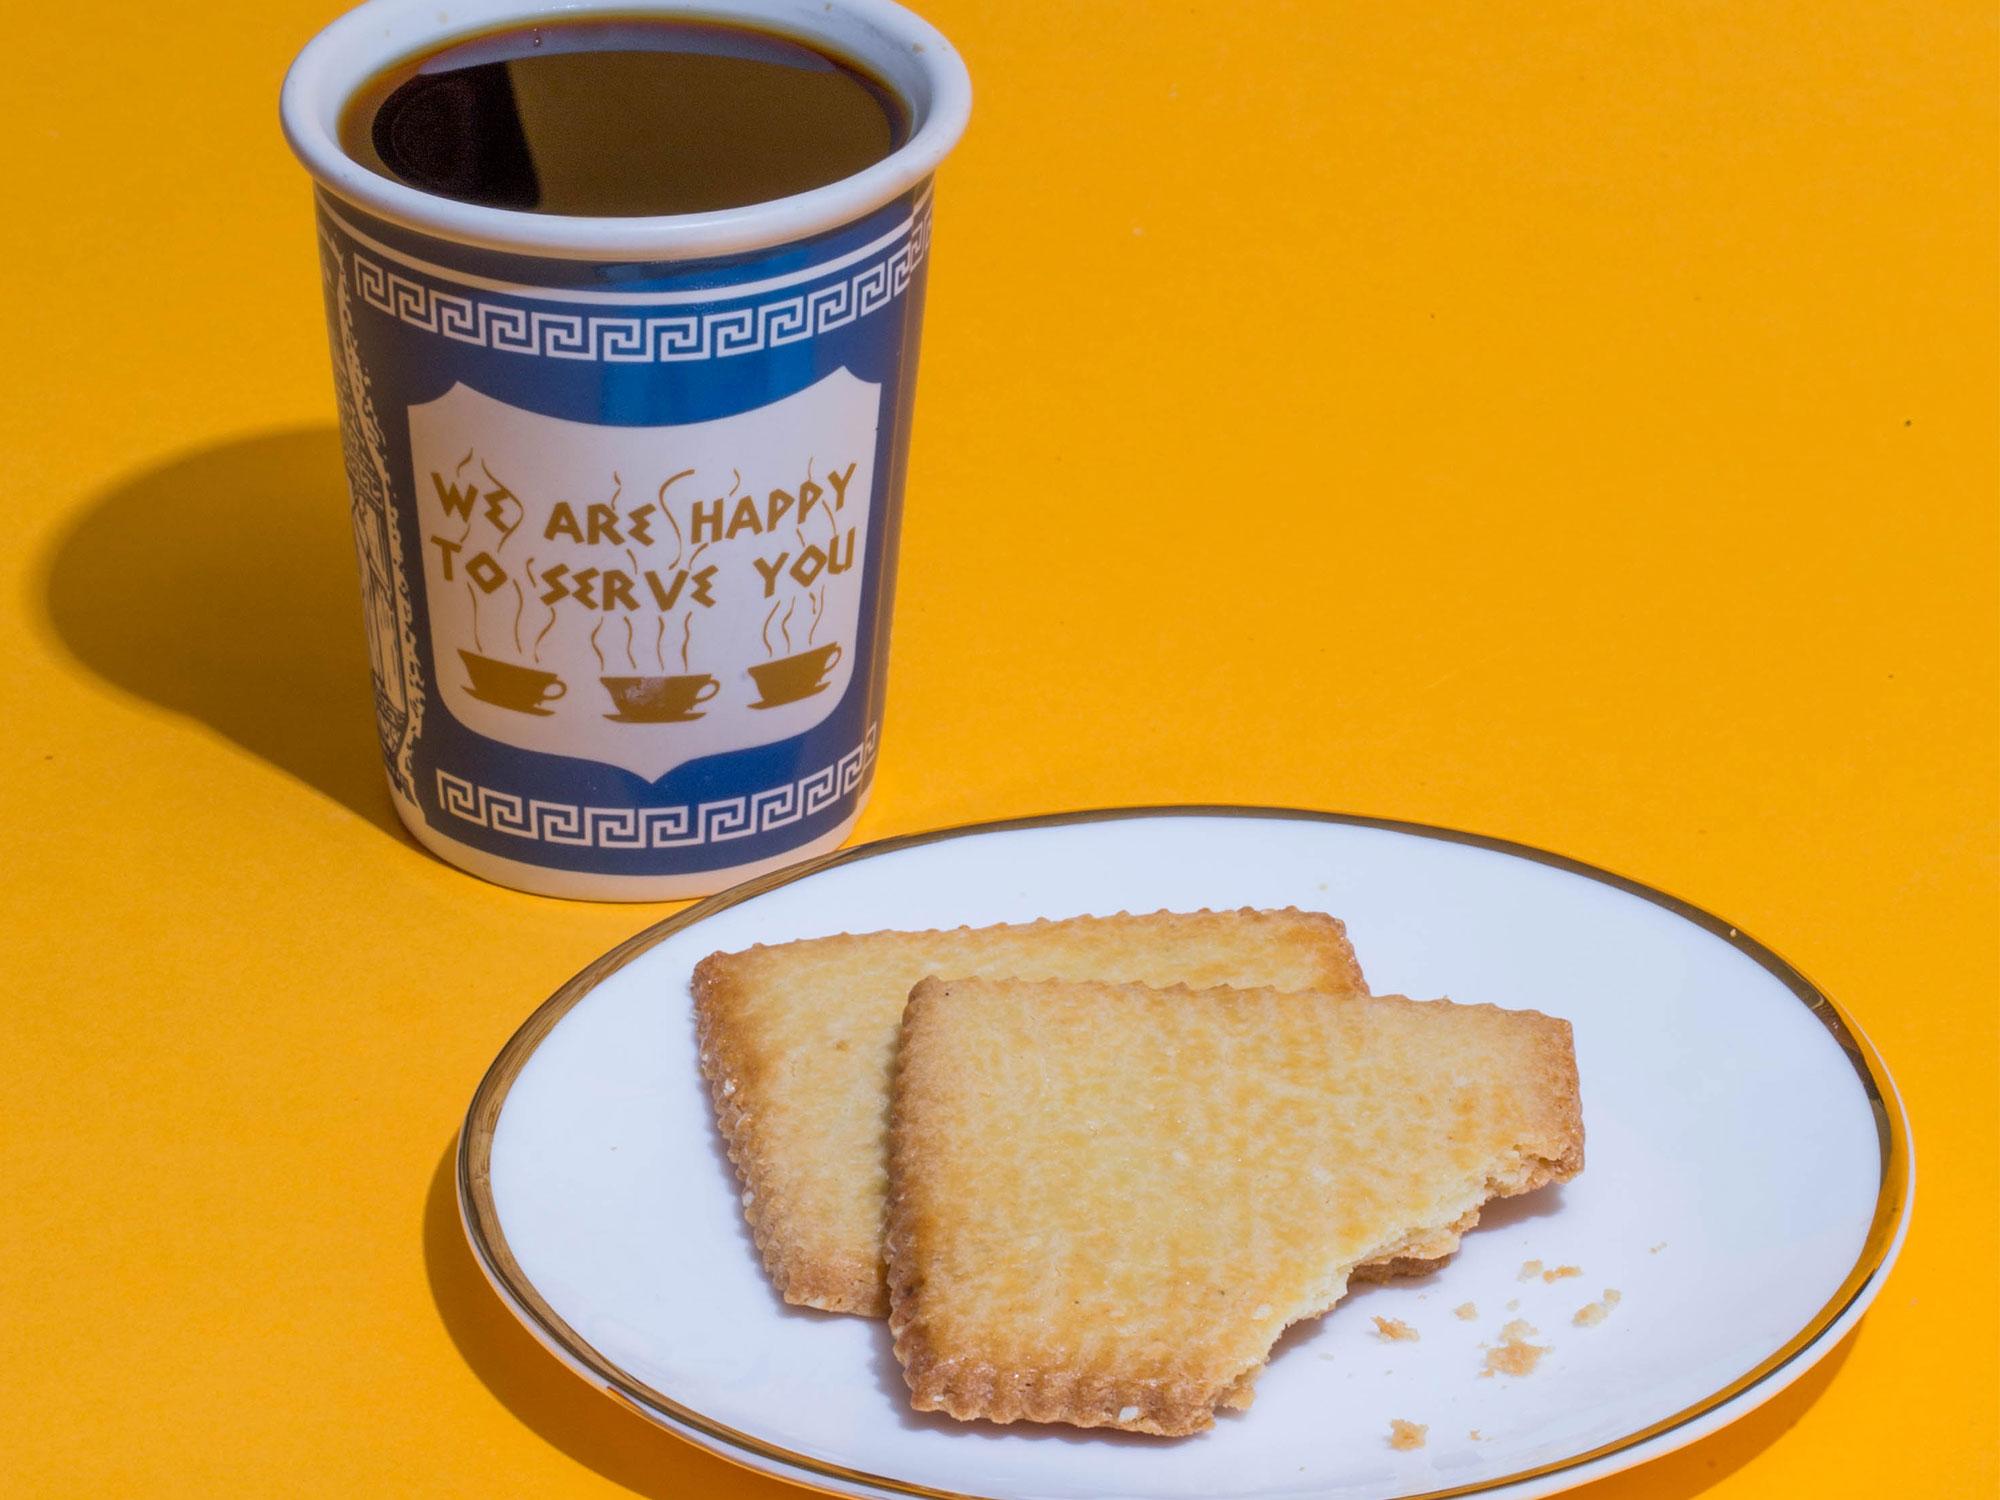 cafe-warshafsky.jpg